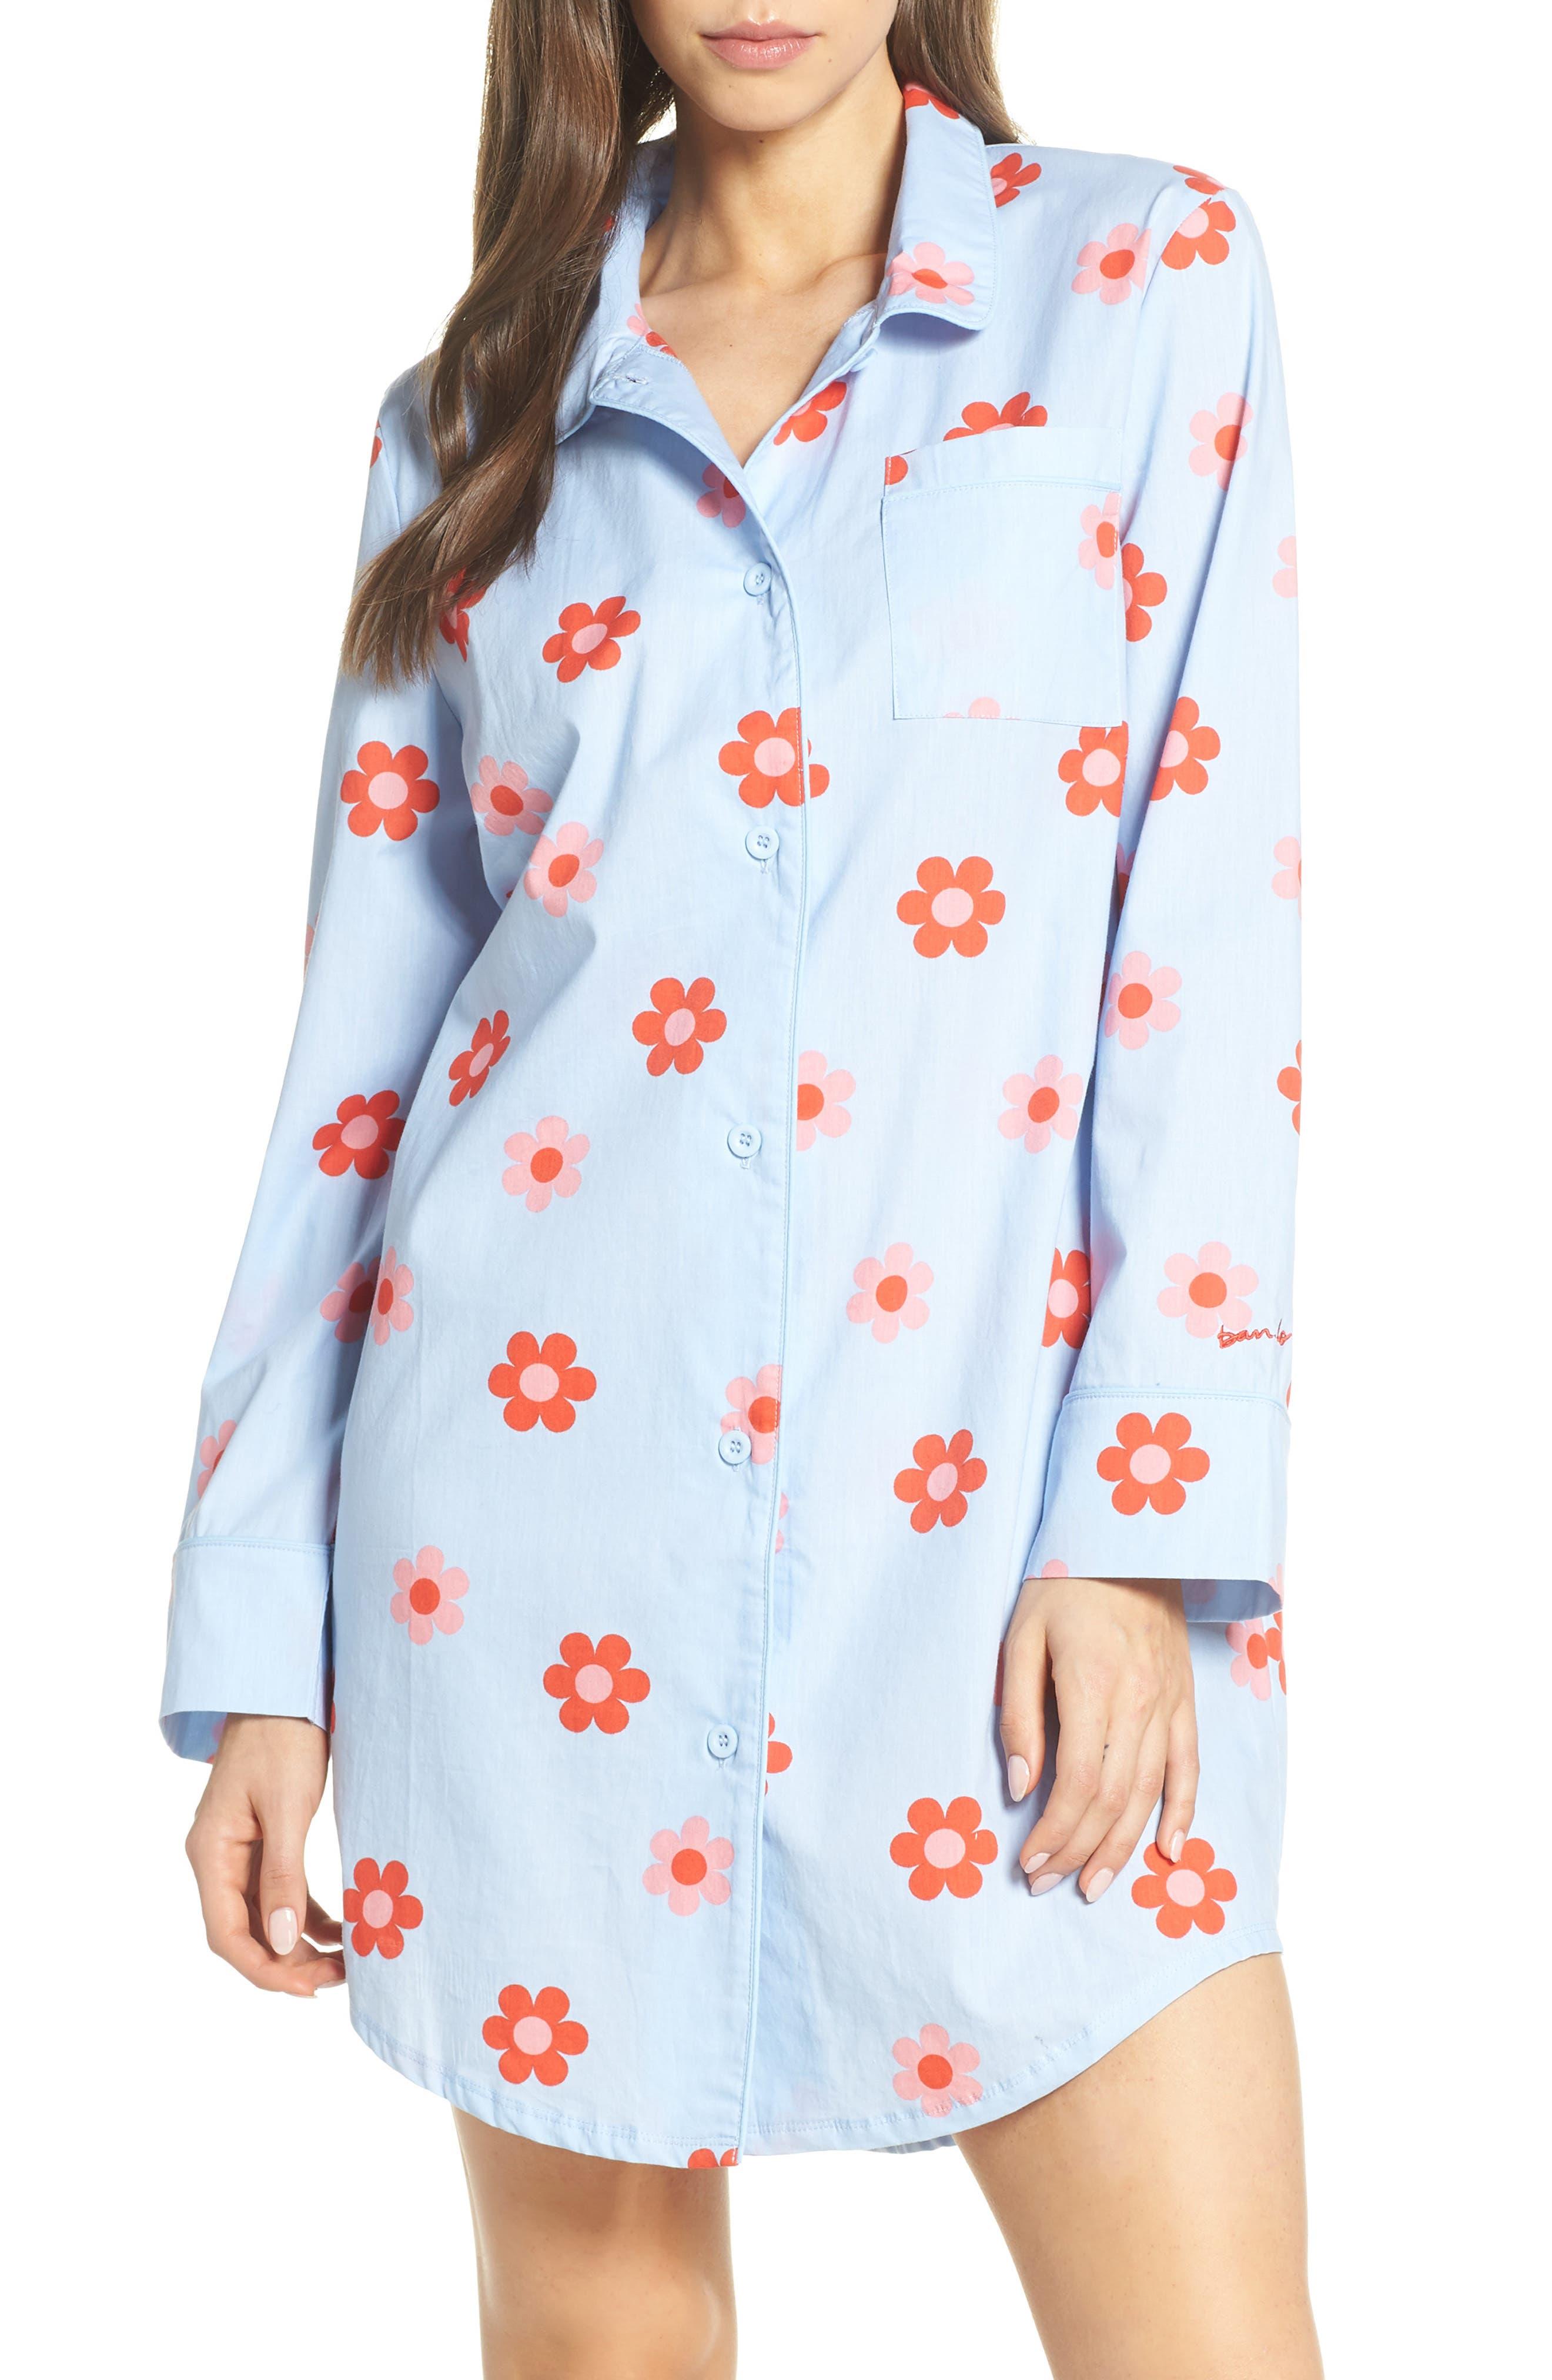 BAN.DO, Retro Daisy Sleep Shirt, Main thumbnail 1, color, LIGHT BLUE